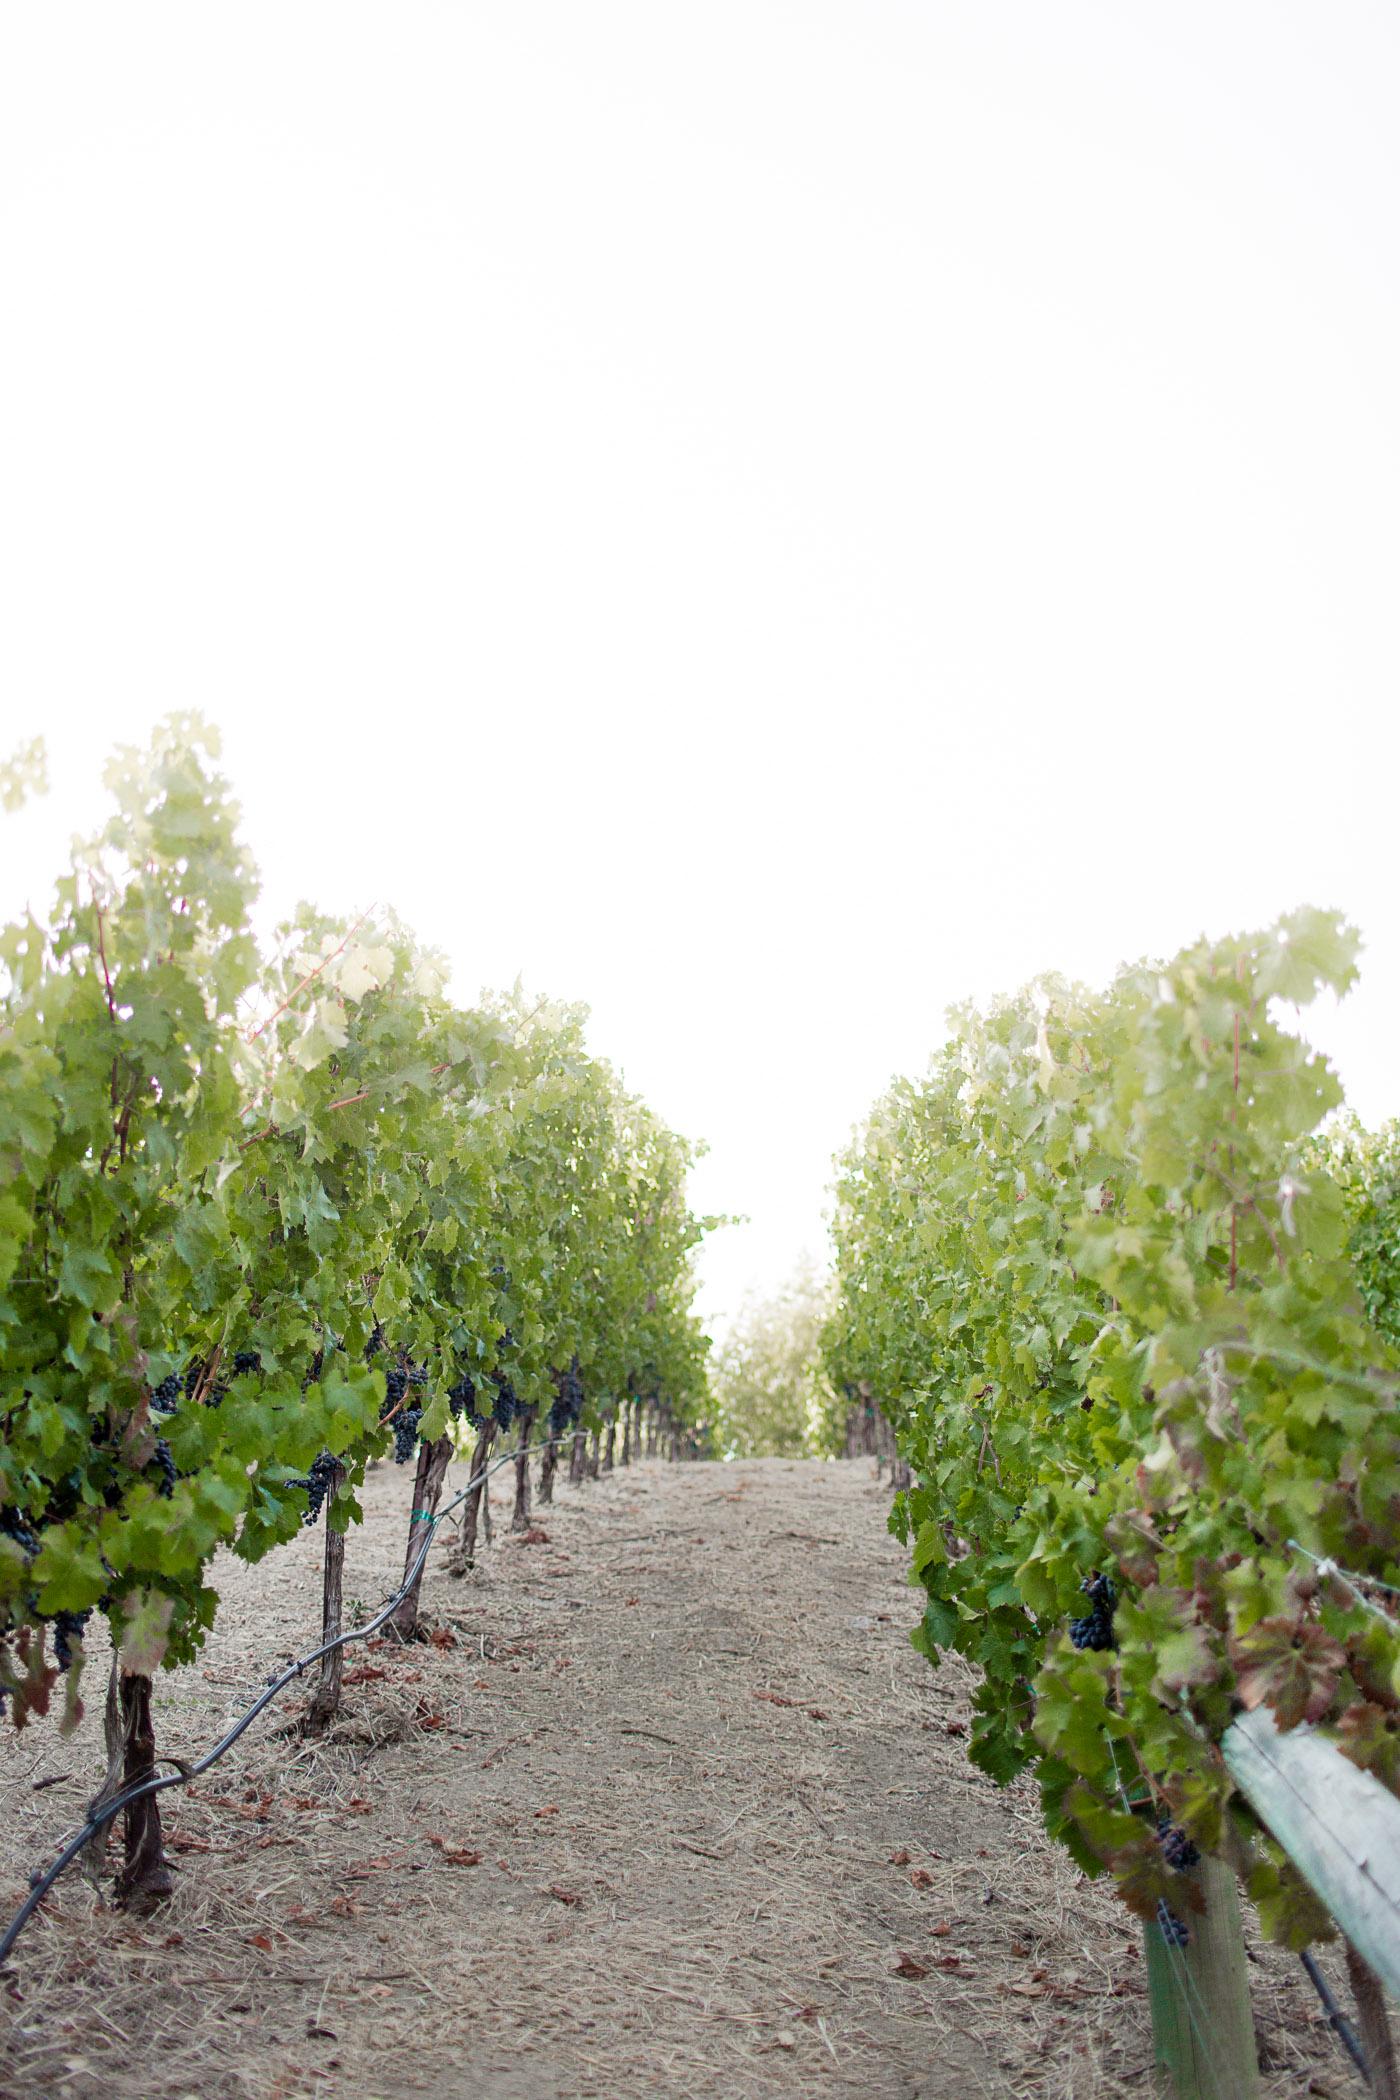 Padis Family Vineyard in Napa Valley, California